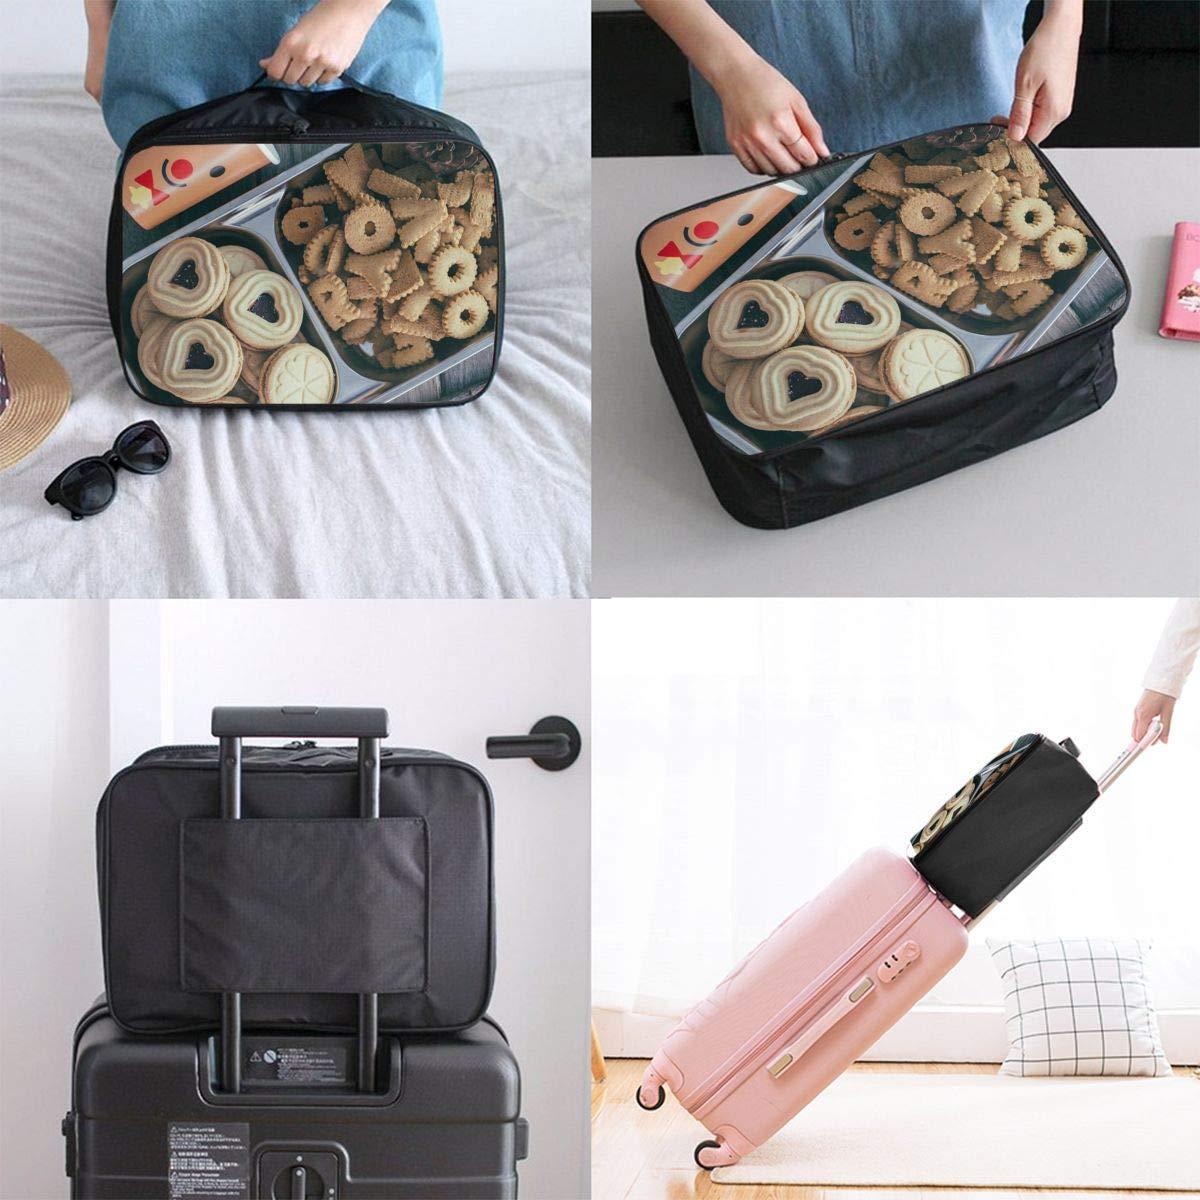 Travel Luggage Duffle Bag Lightweight Portable Handbag Biscuits Cookies Large Capacity Waterproof Foldable Storage Tote